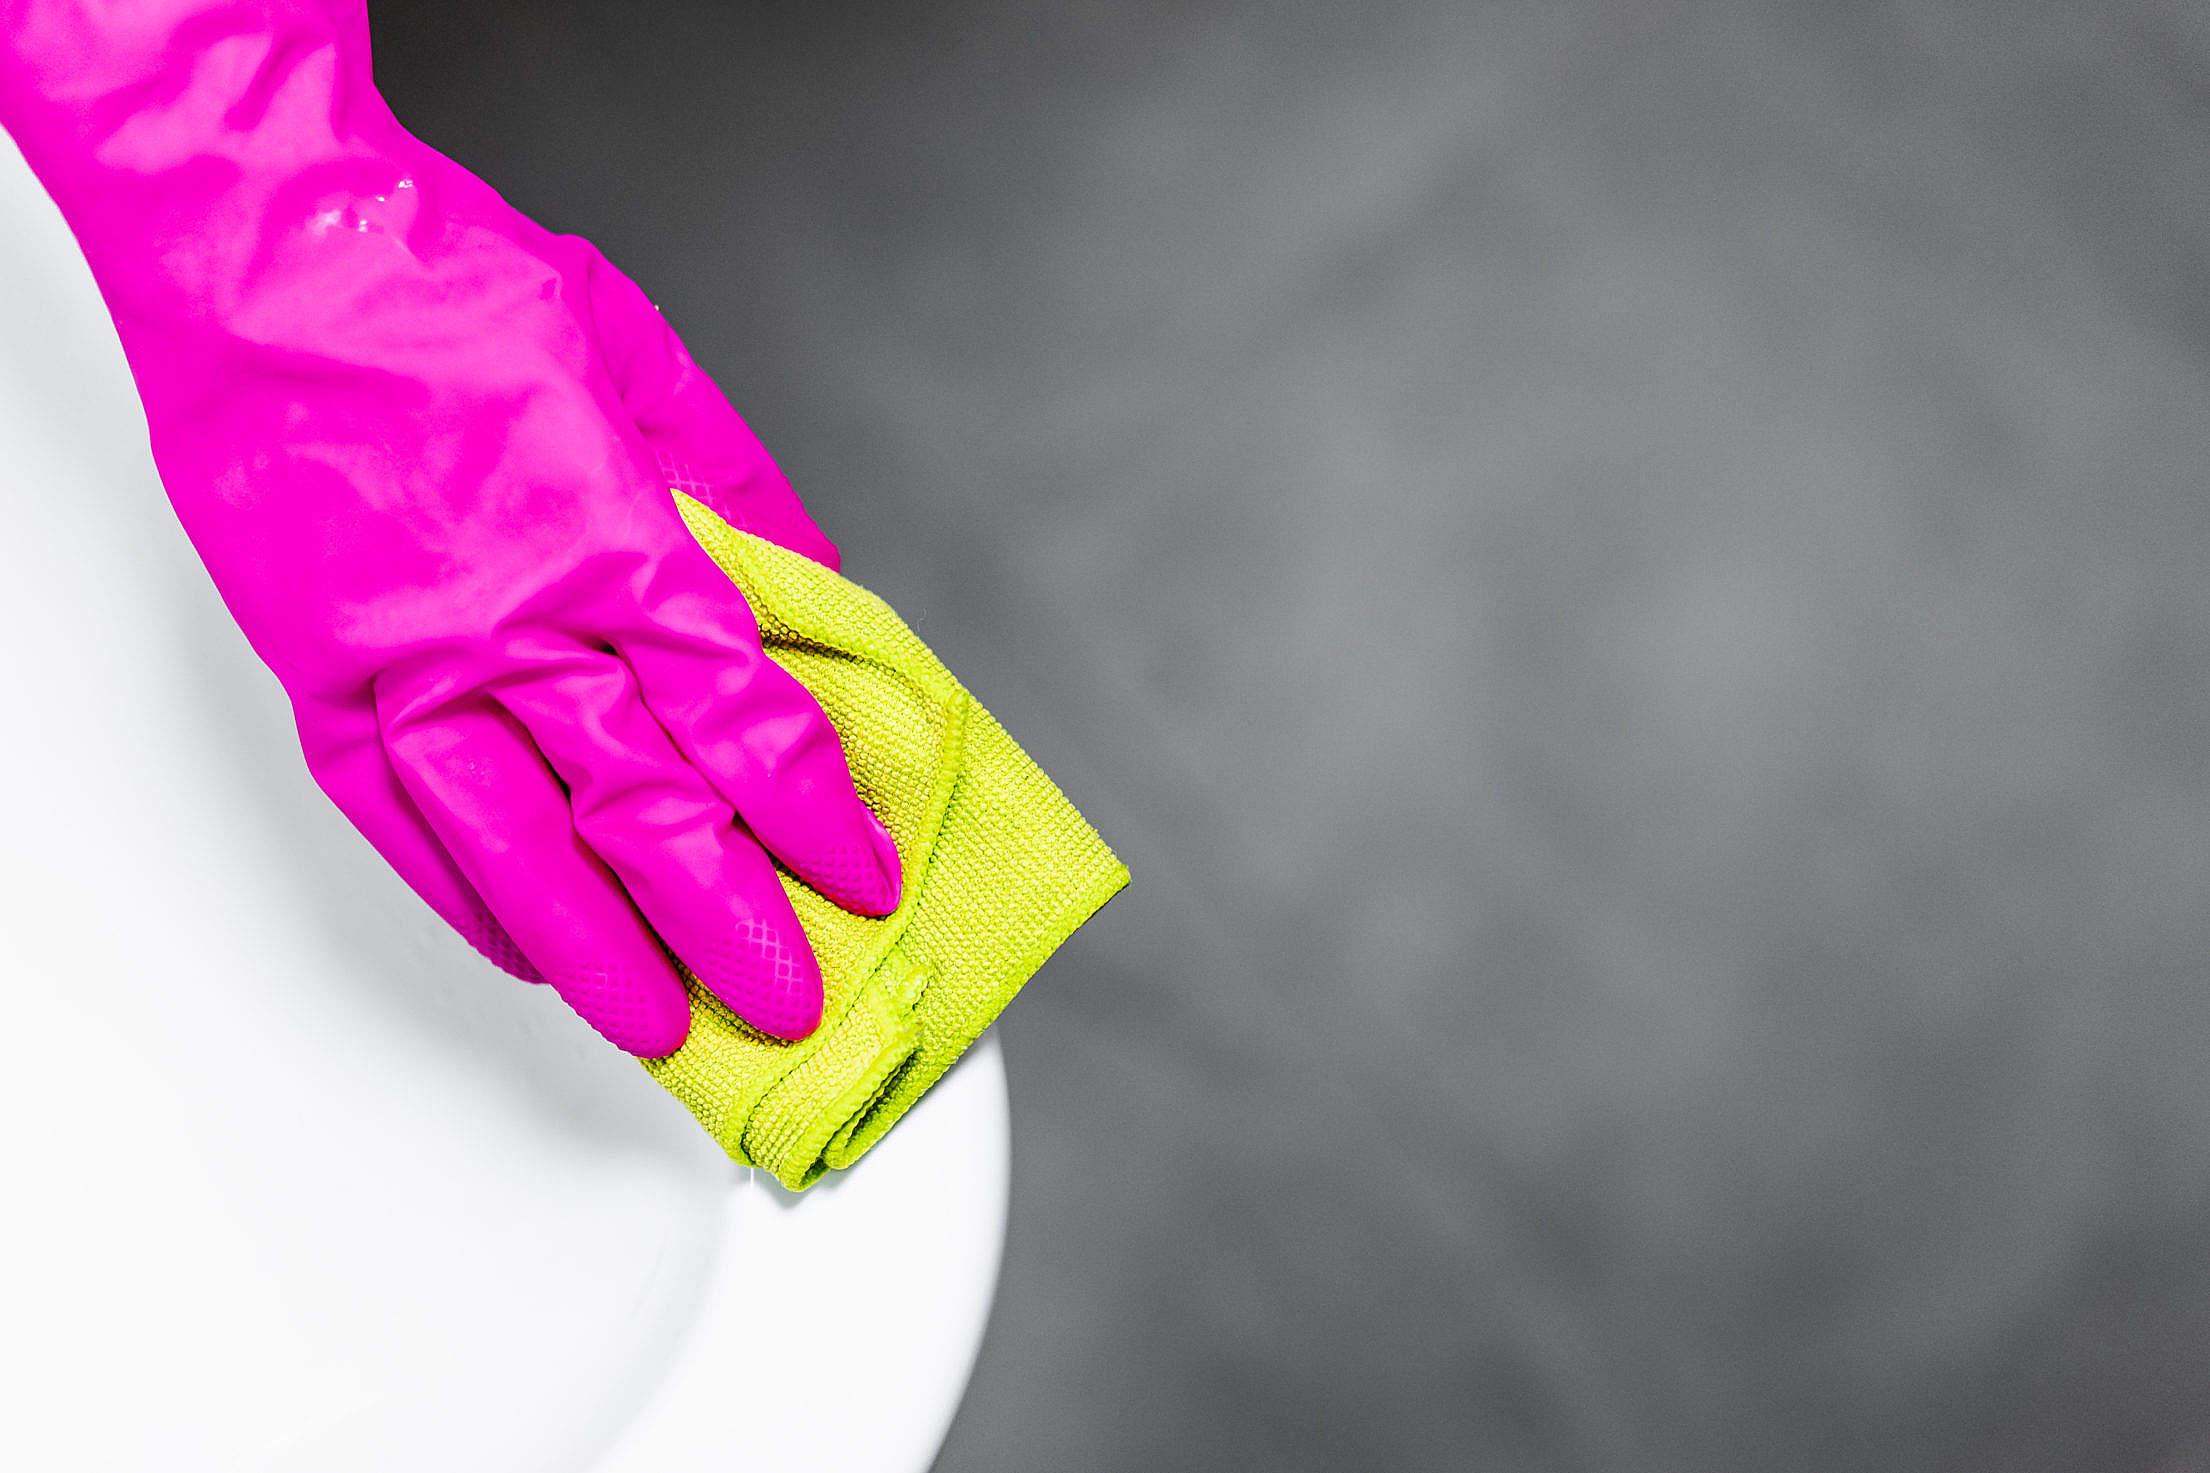 Cleaning Service Polishing a Ceramic Wash Basin Free Stock Photo